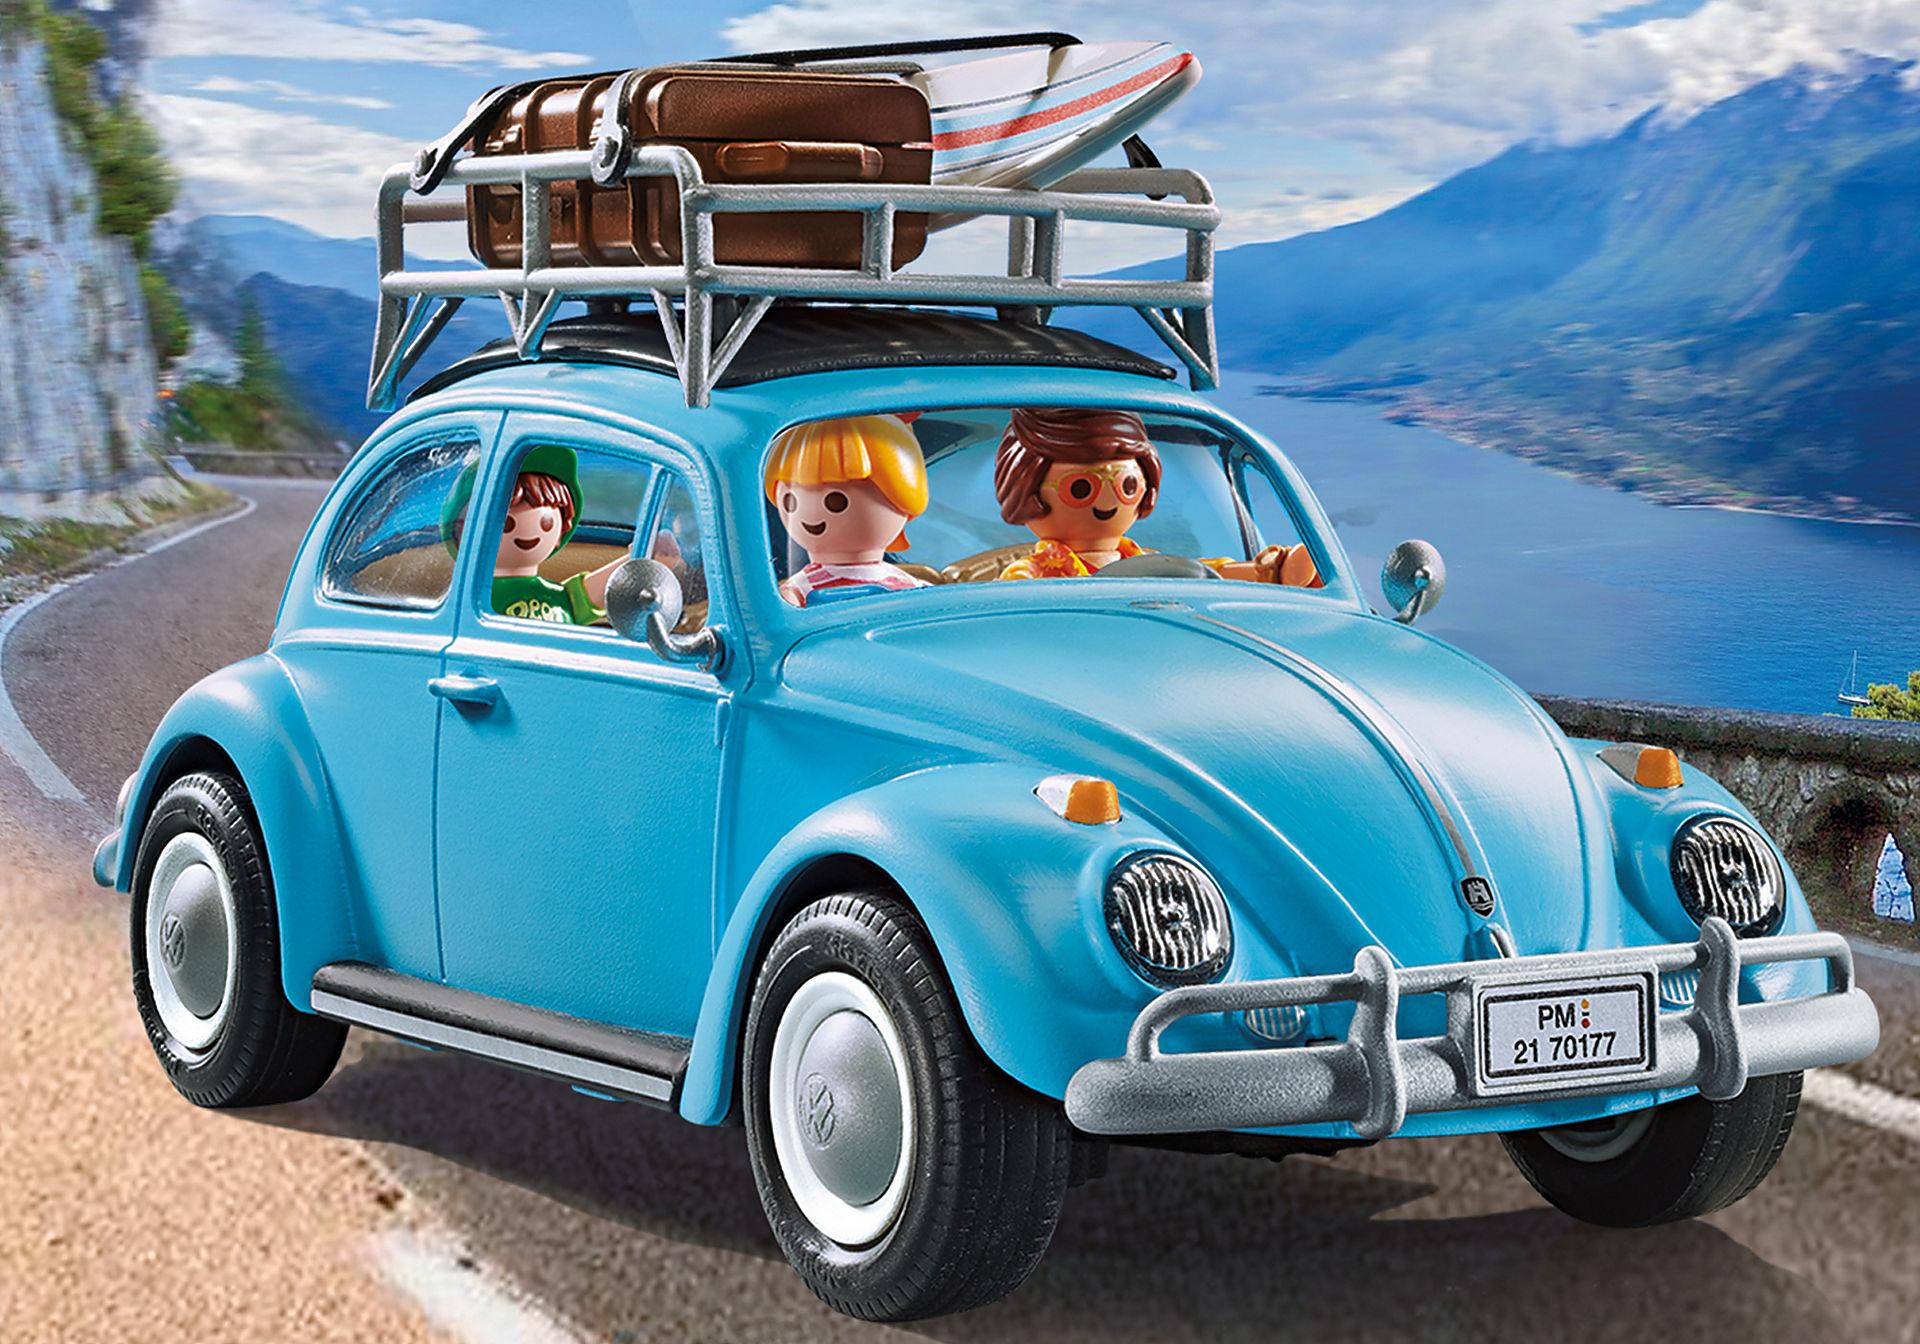 70177 Volkswagen Maggiolino zoom image6